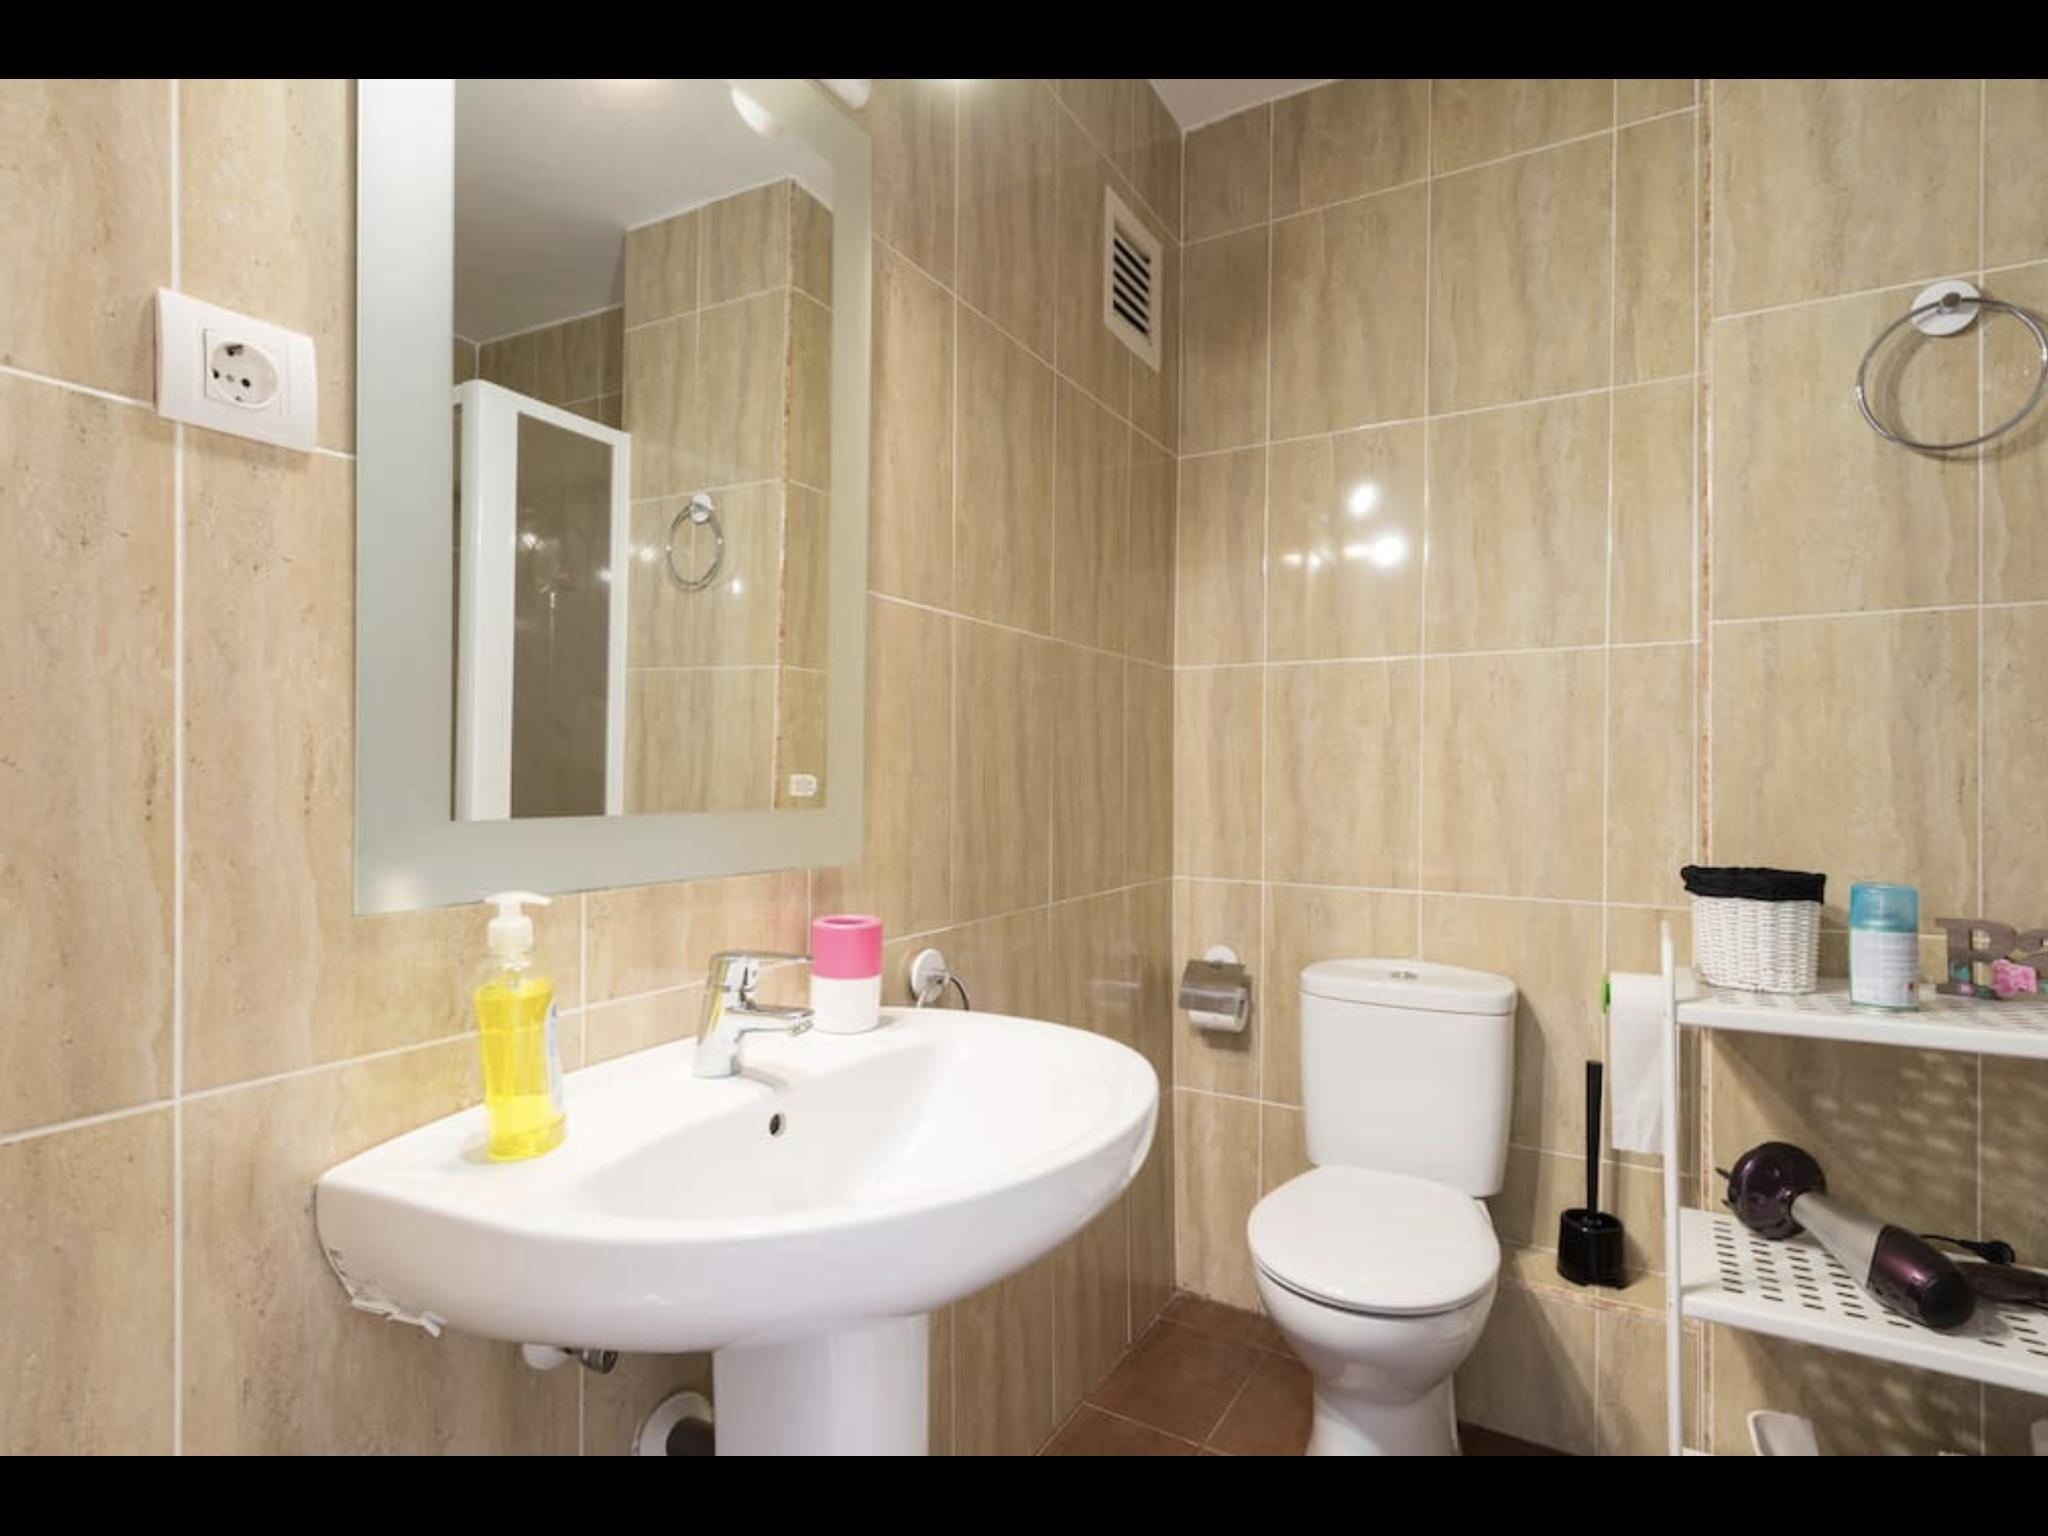 Comedias private room in Málaga for single use